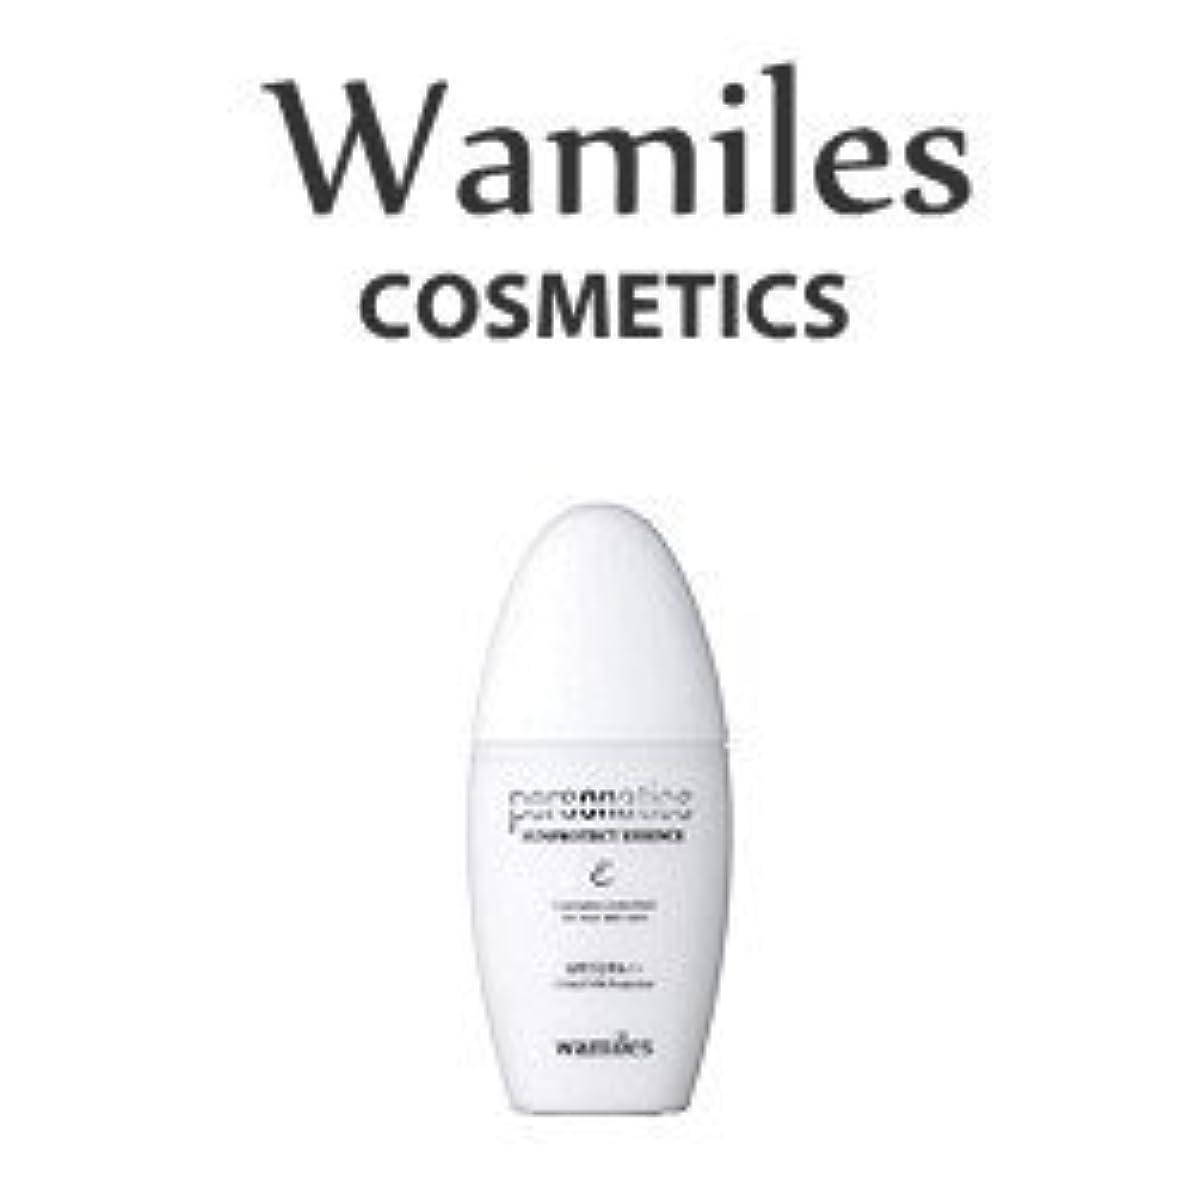 wamiles/ワミレス サンプロテクトエッセンス 30ml 美容 化粧水